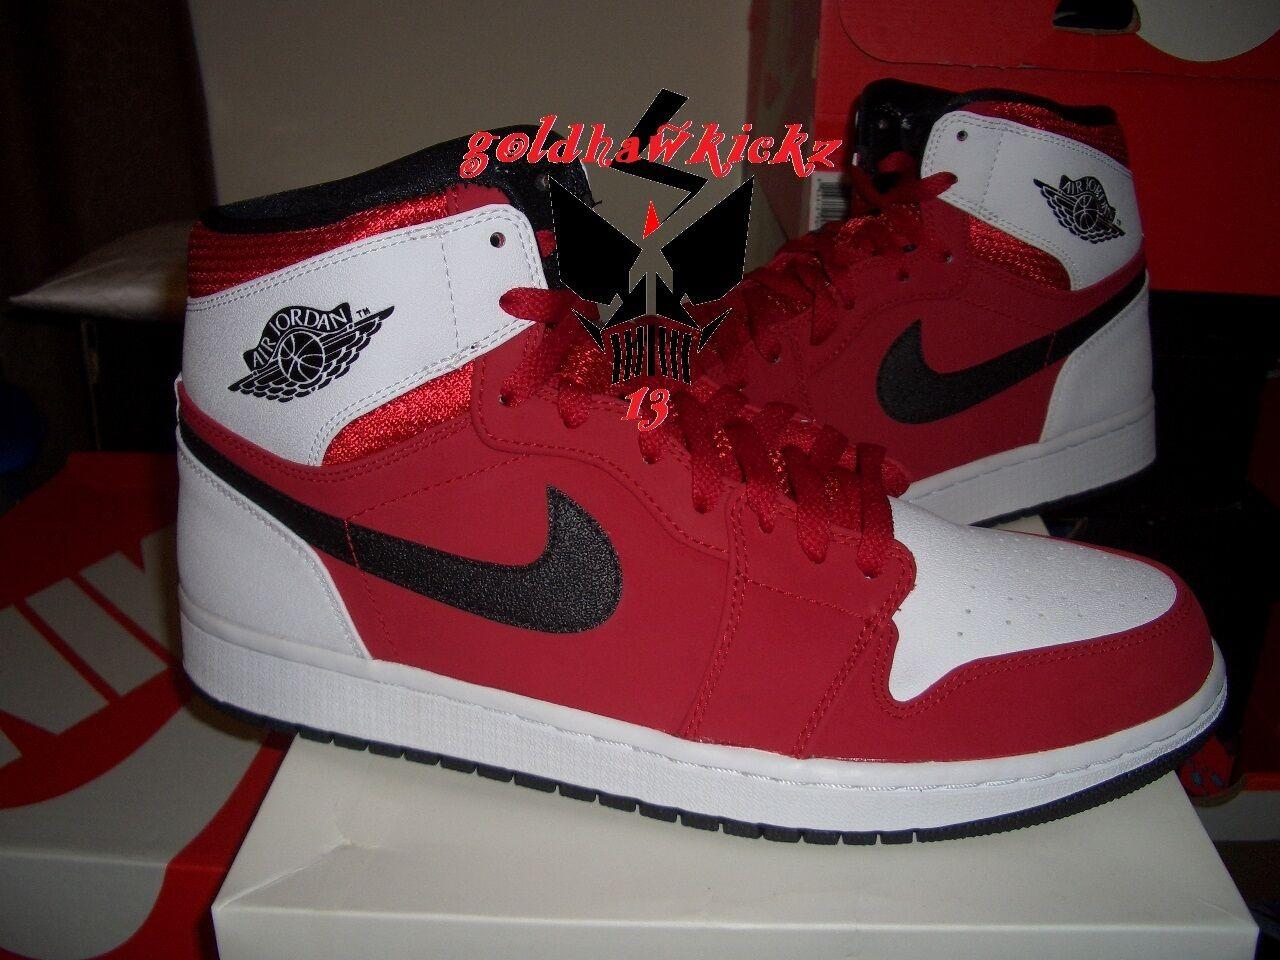 Nike Air Jordan 1 retro High gimnasio Griffin Rojo Negro Blake Griffin gimnasio PE 332550 601 Carmine comodo y atractivo 475a96